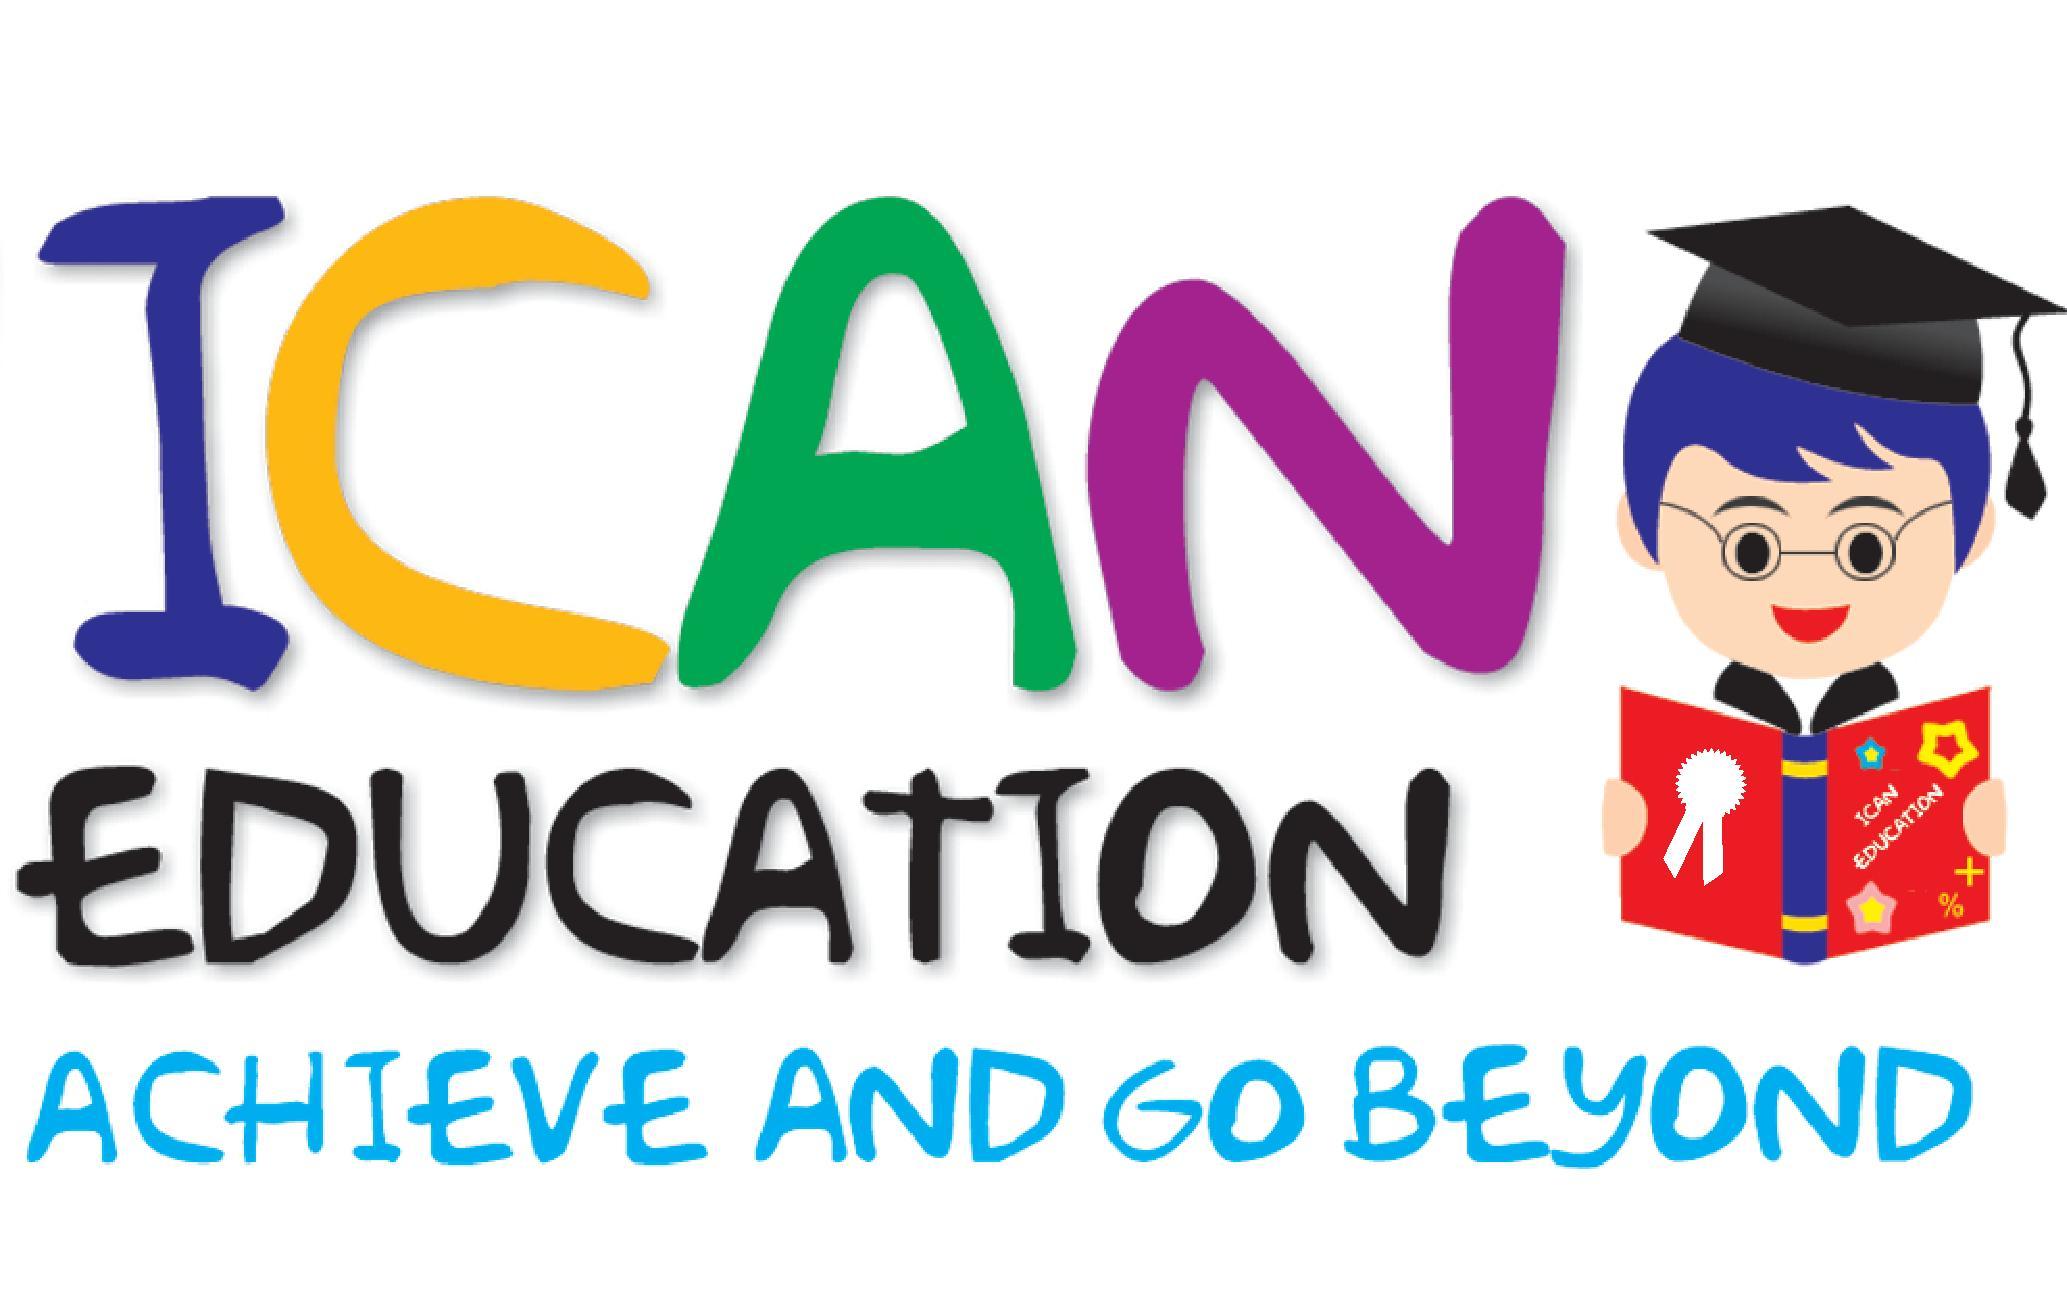 Ican education - children's education franchise